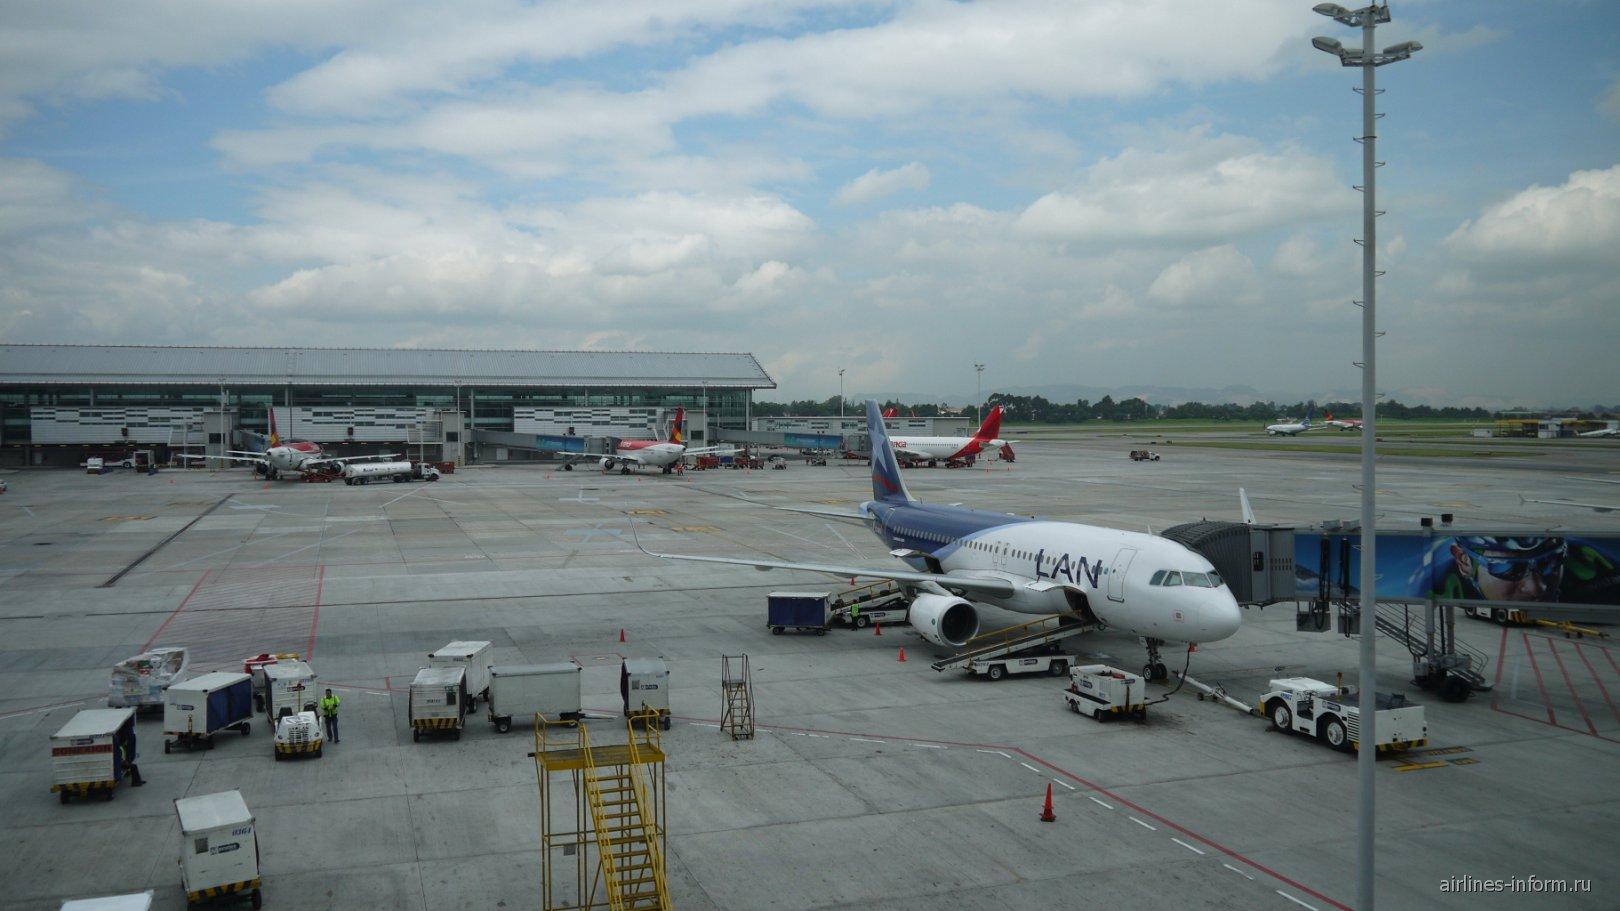 Перрон аэропорта Богота Эльдорадо